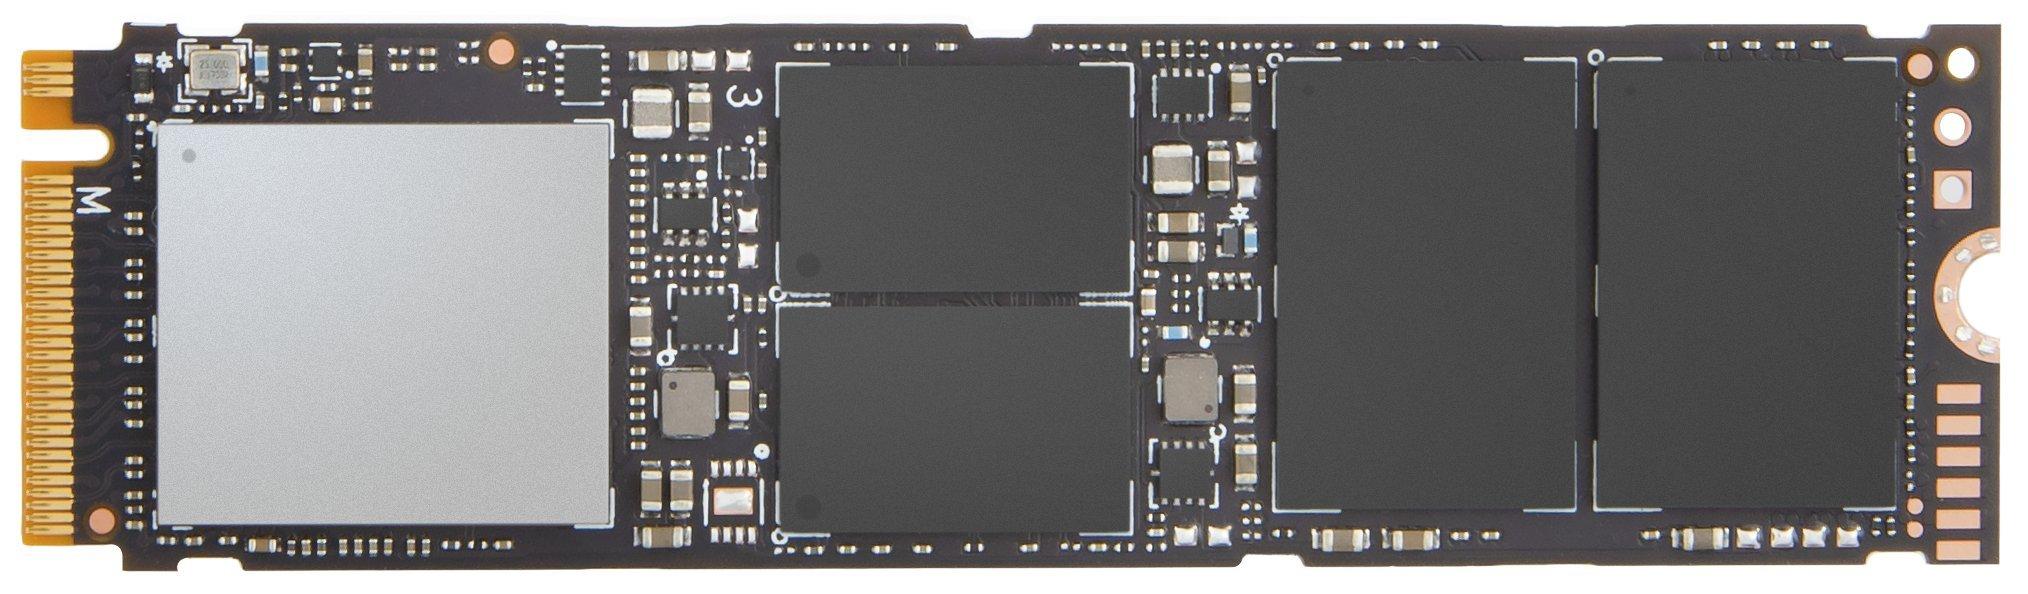 Intel SSD 760P Series (512GB, M.2 80mm PCIe 3.0 x4, 3D2, TLC) by Intel (Image #4)